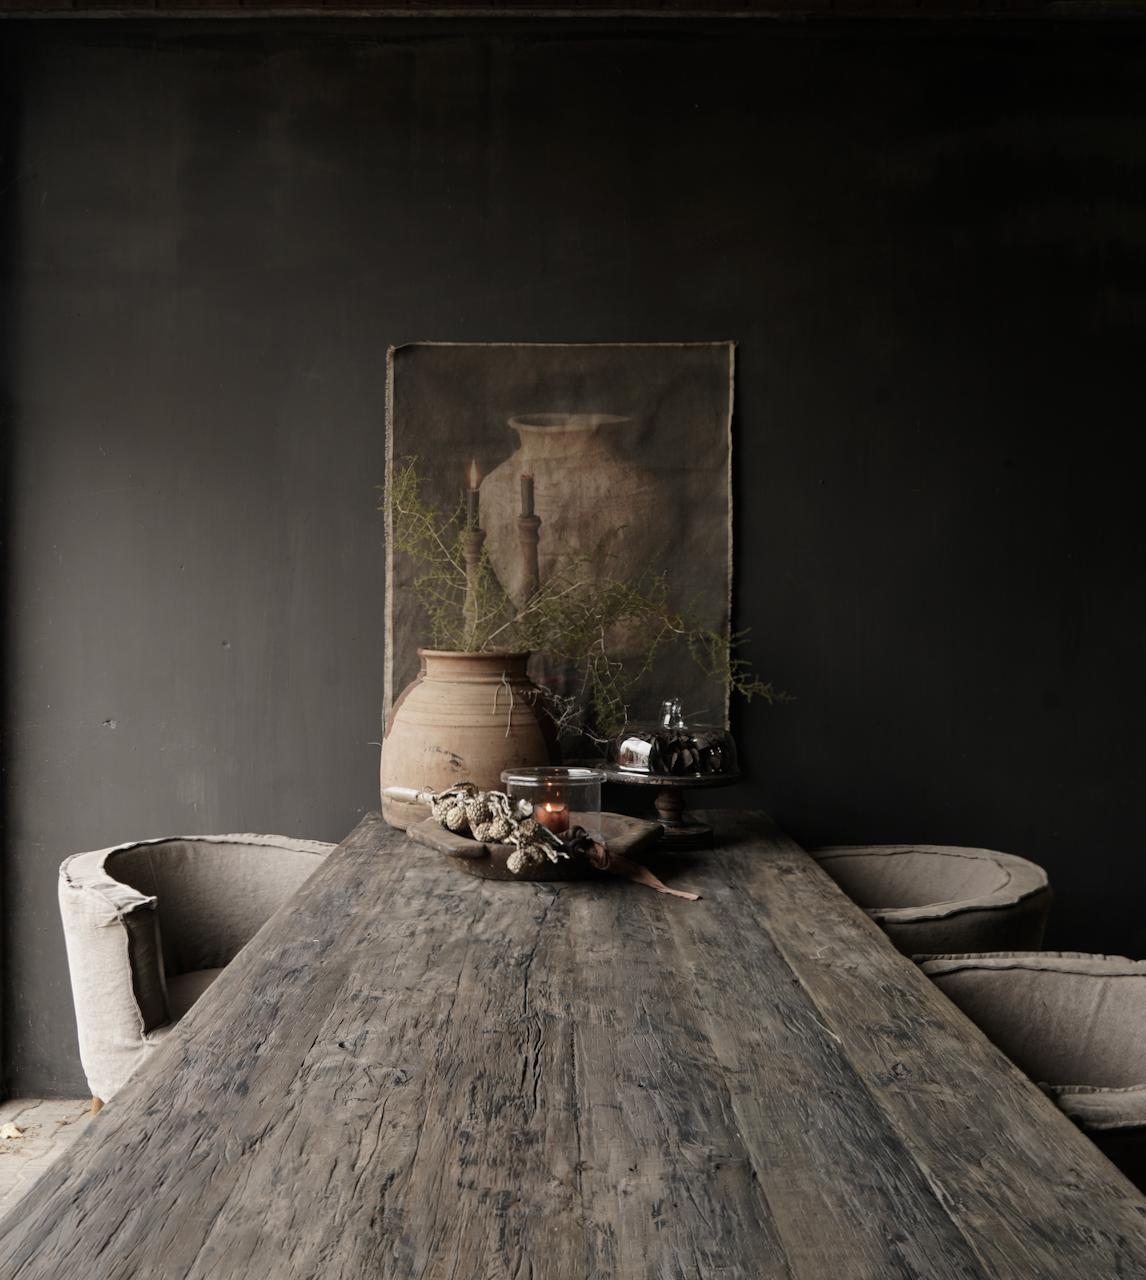 Stoer donker oud houten eetkamer tafel  met A poot-5